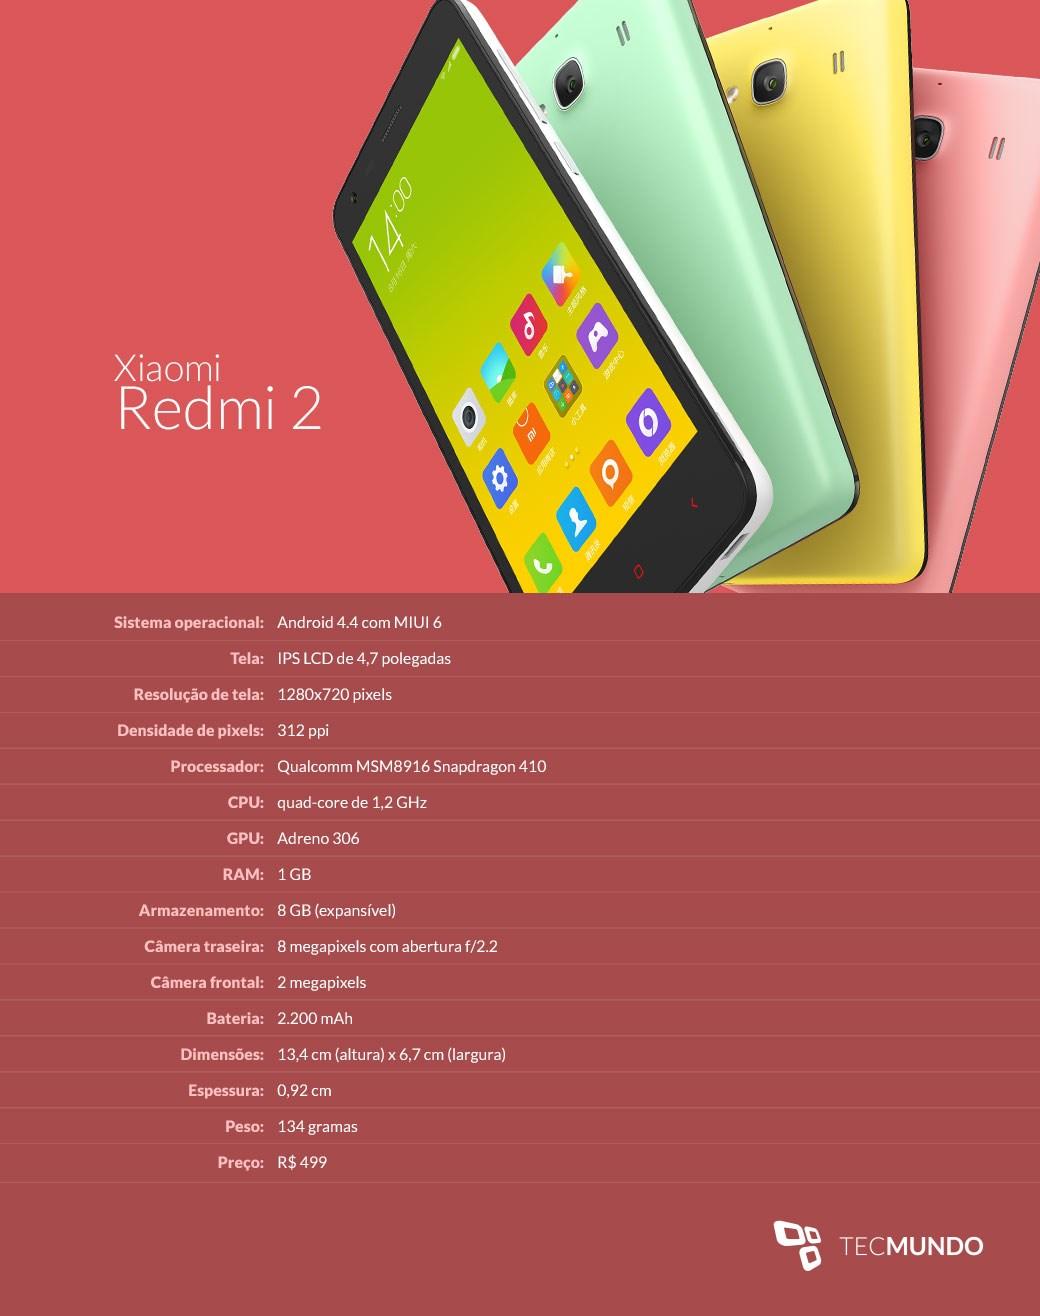 Review Redmi 2